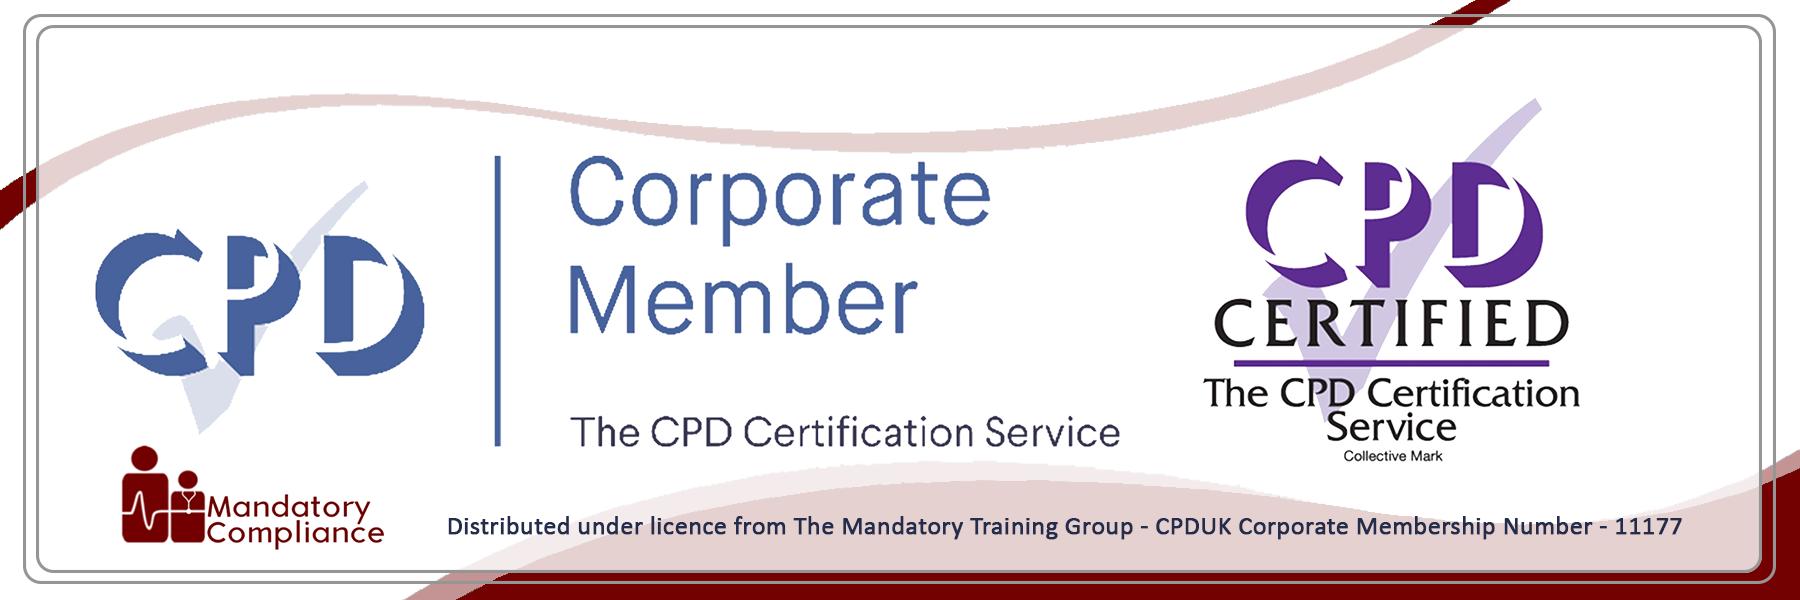 Work-Life Balance - Online Training Course - CPDUK Accredited - Mandatory Compliance UK -